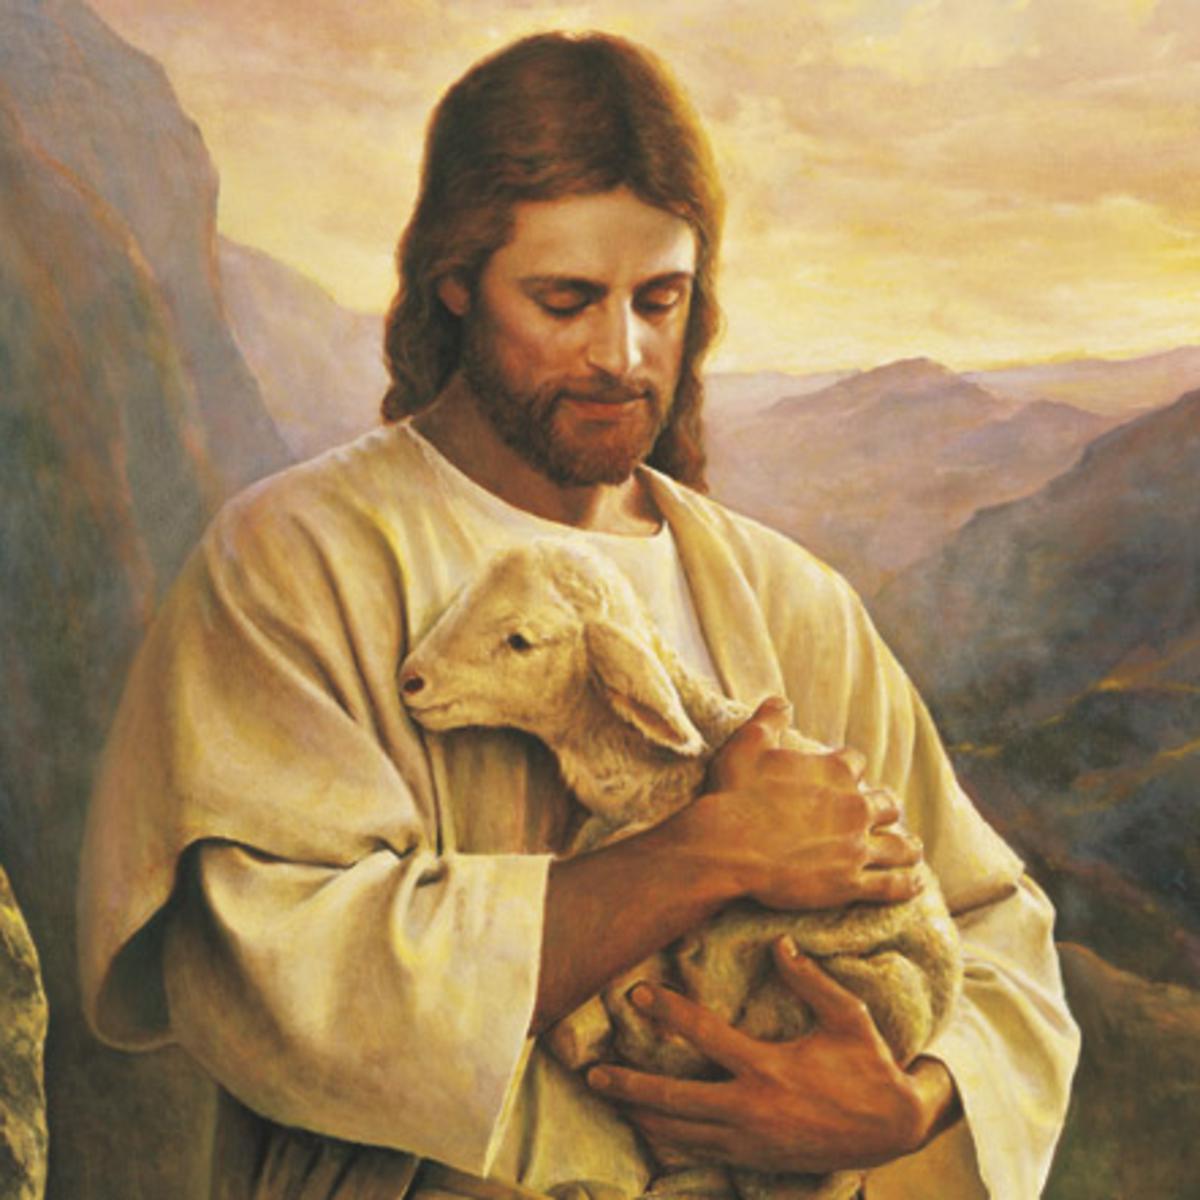 image of Christ & lamb